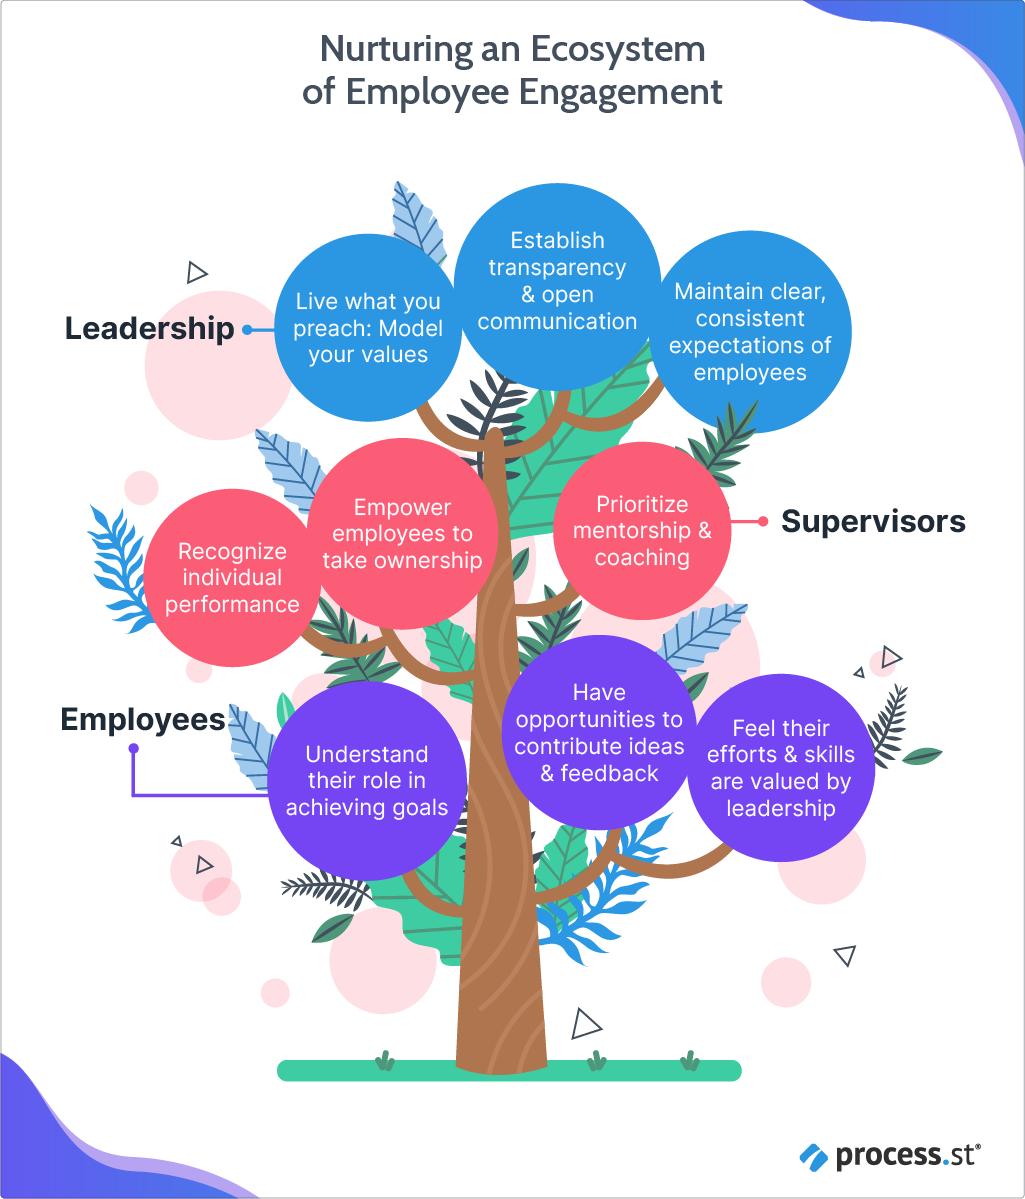 Nurturing an ecosystem of employee engagement